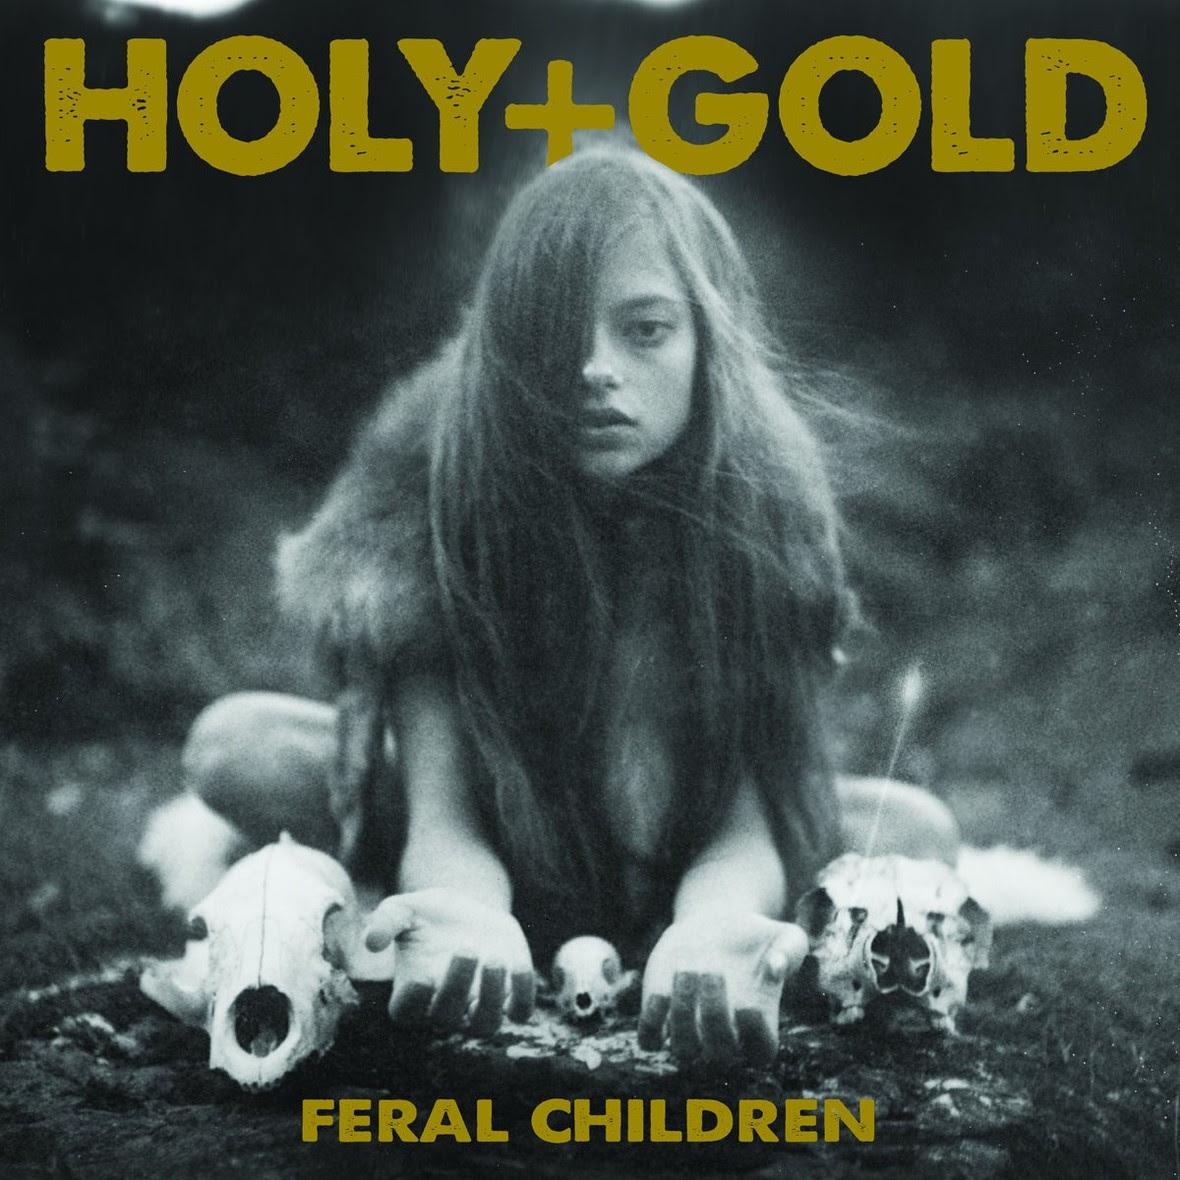 holy gold feral children